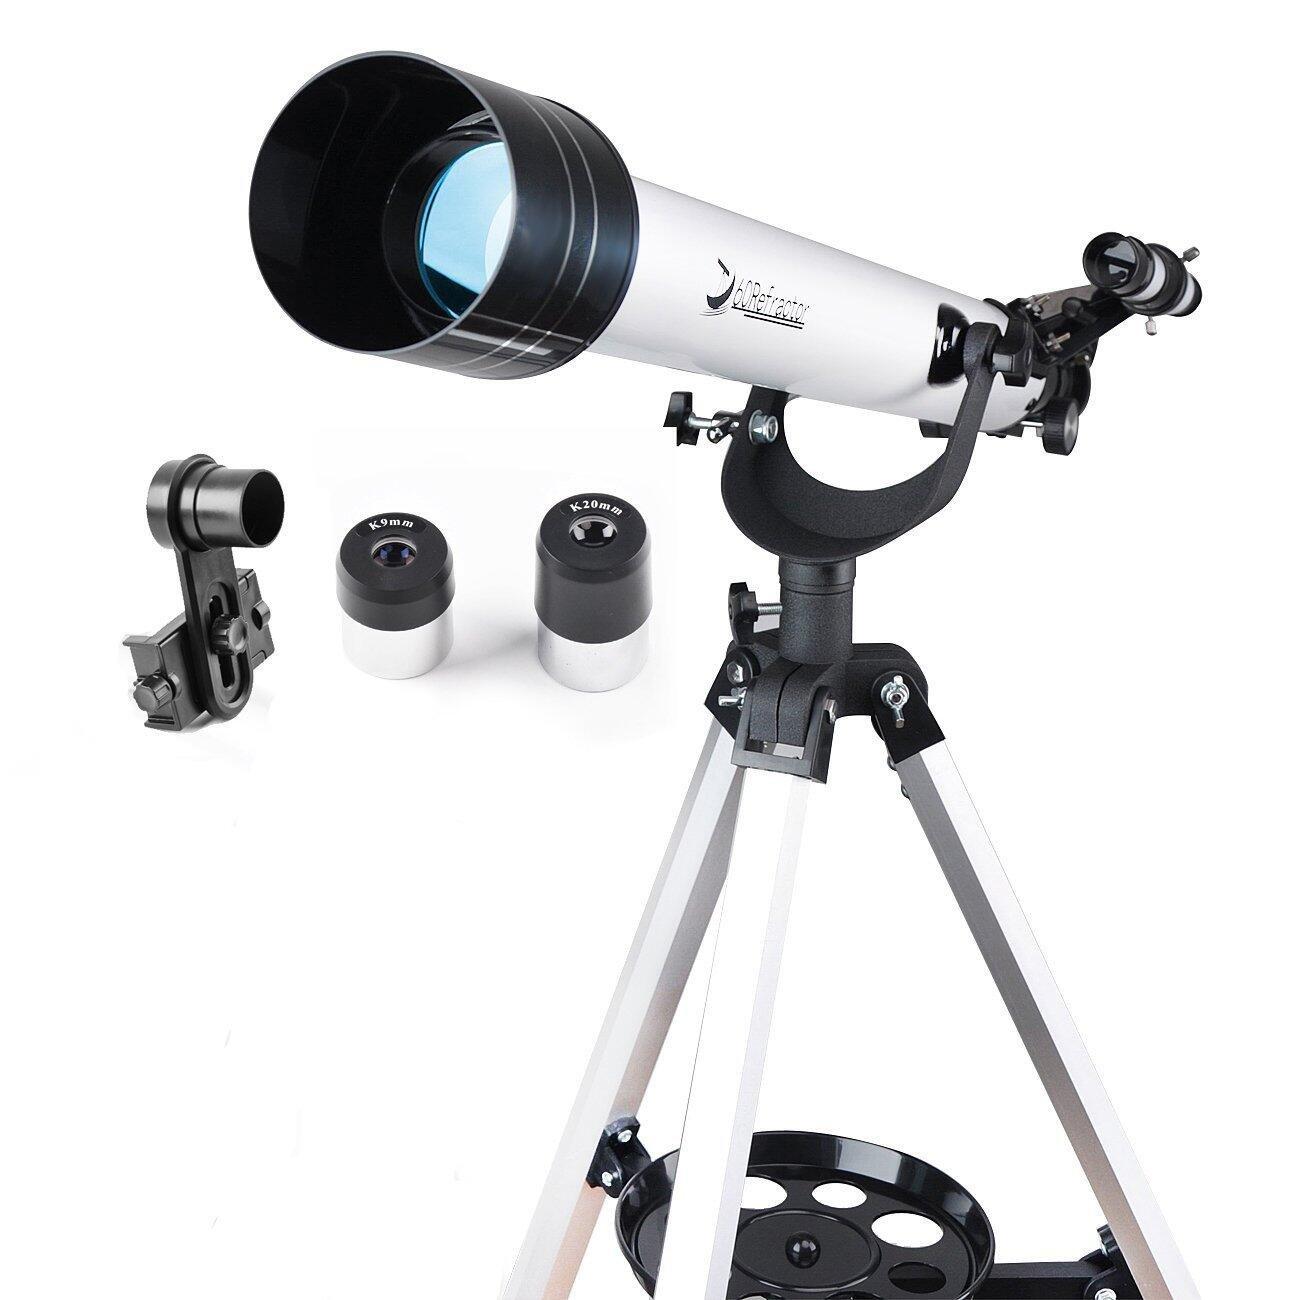 qhtl telescopio 60 mm AZ - Telescopio refractor con 10 mm ...